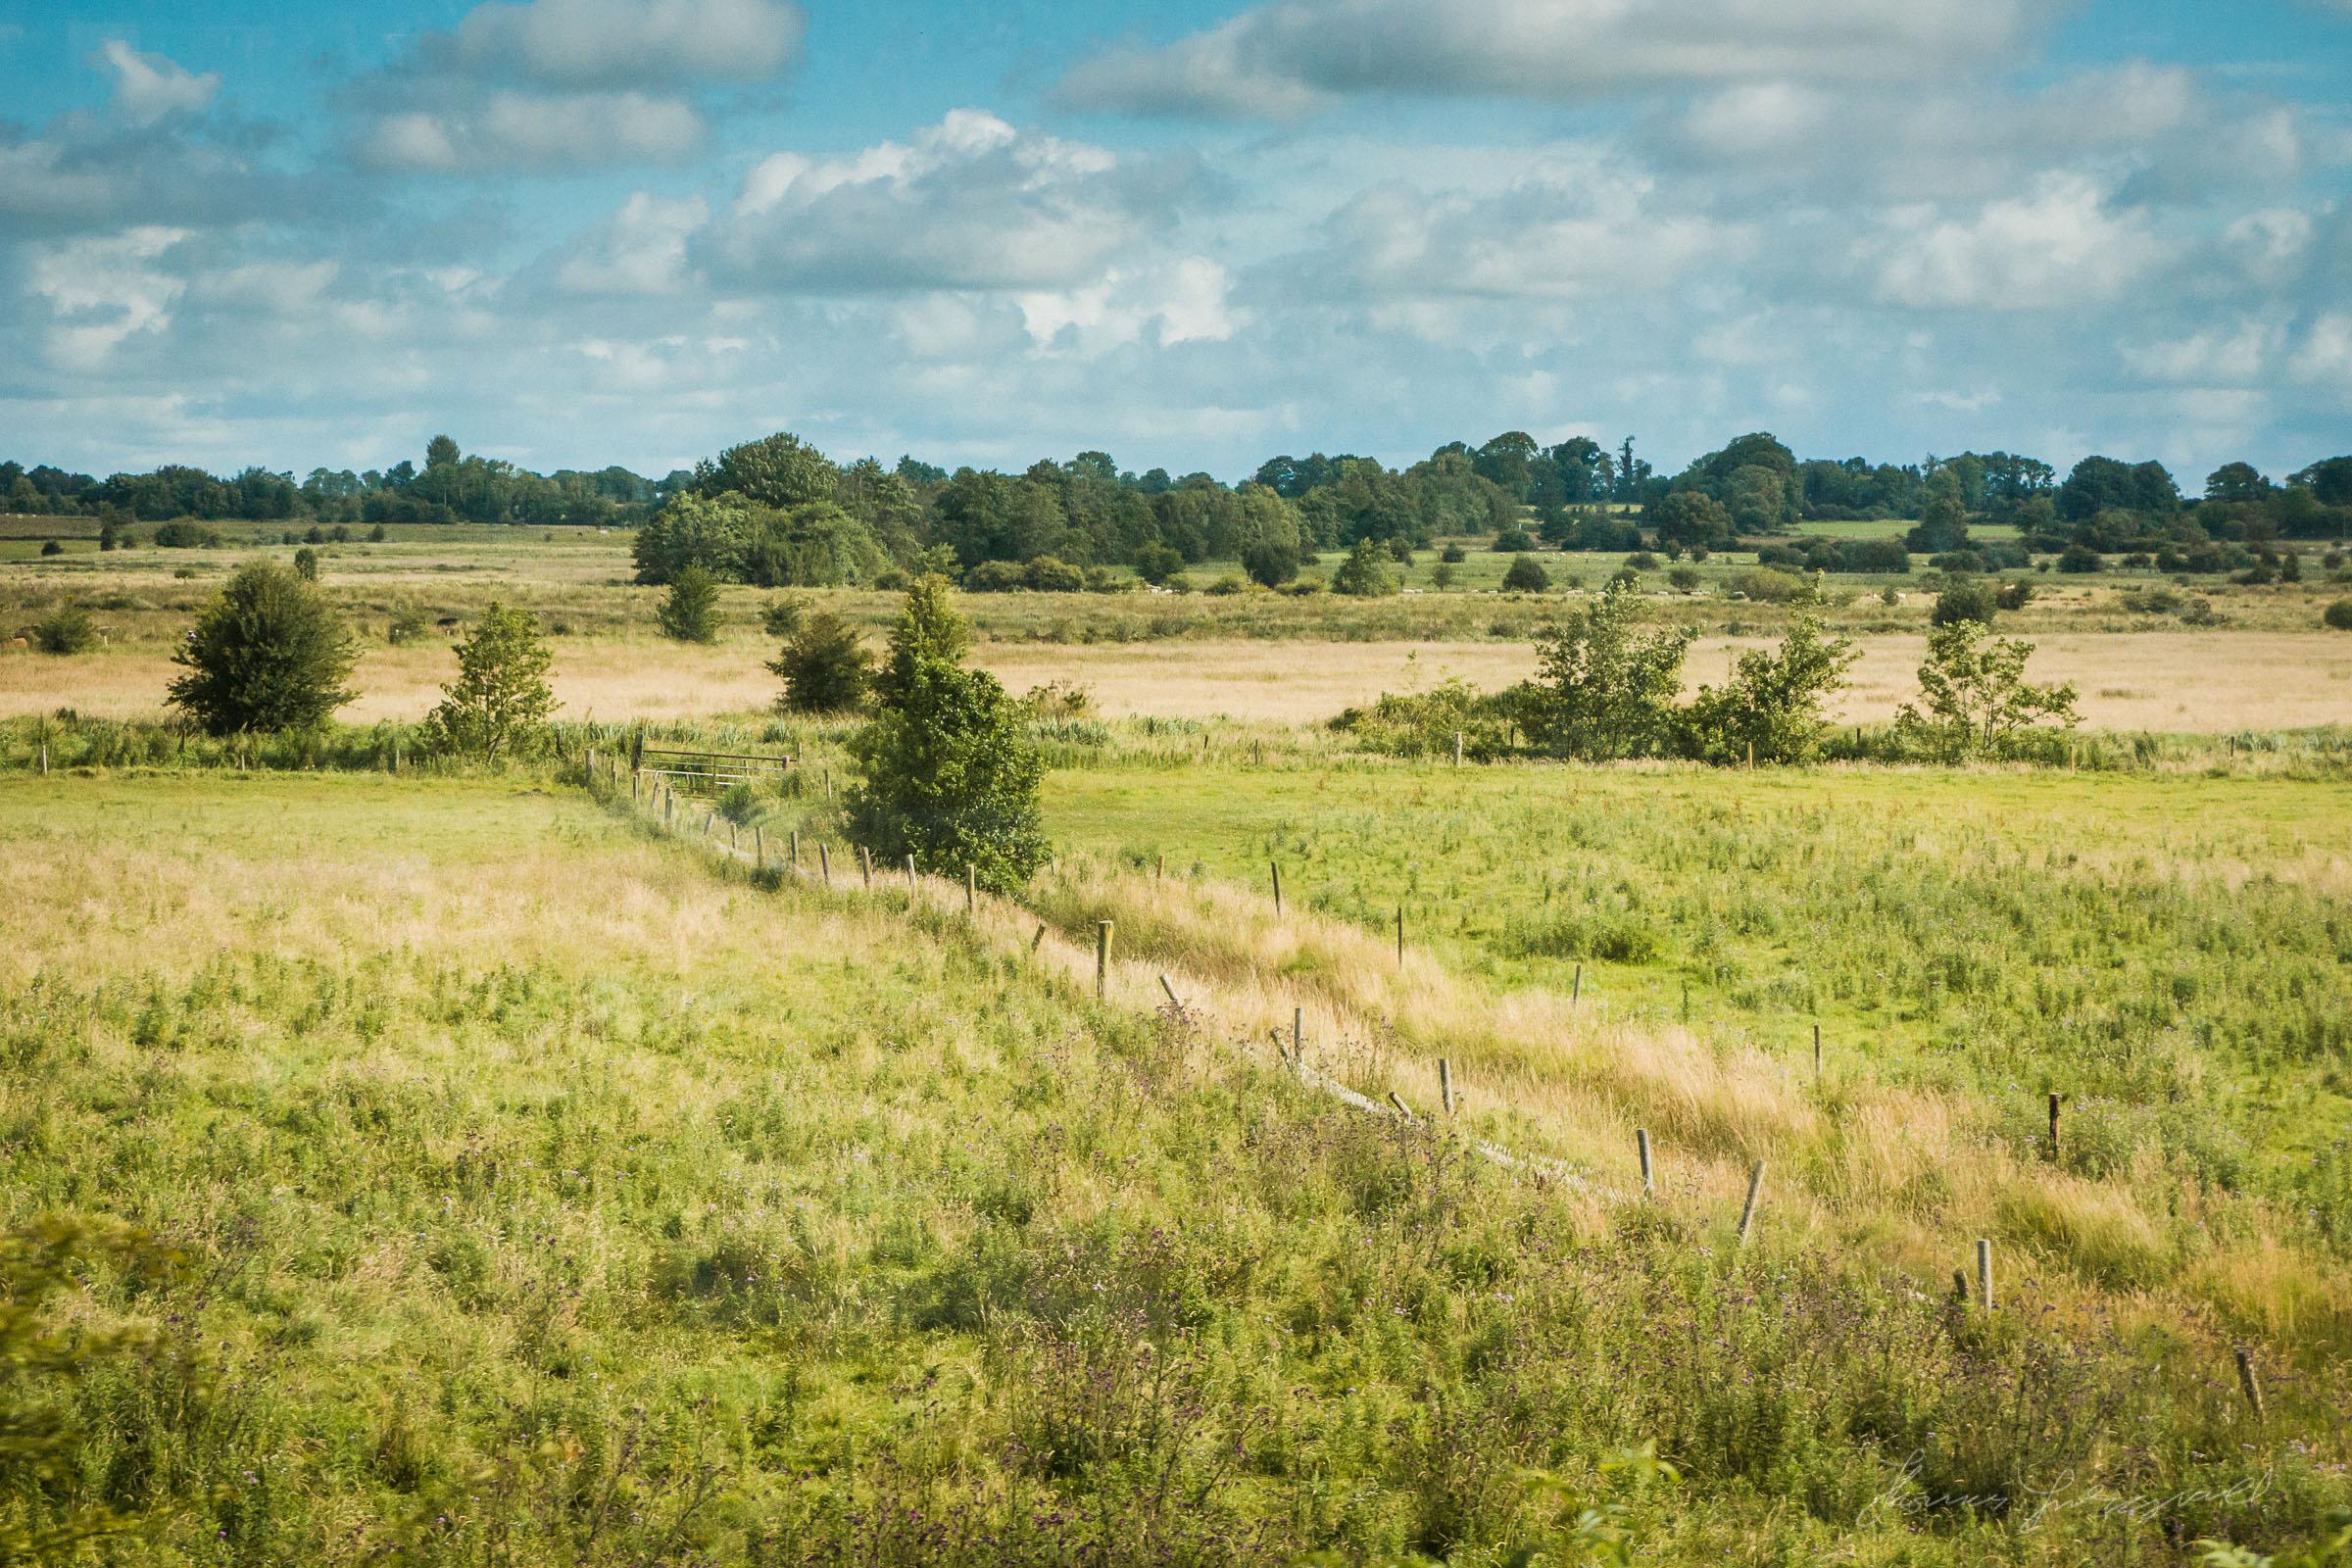 Farmland in the Midlands of Ireland